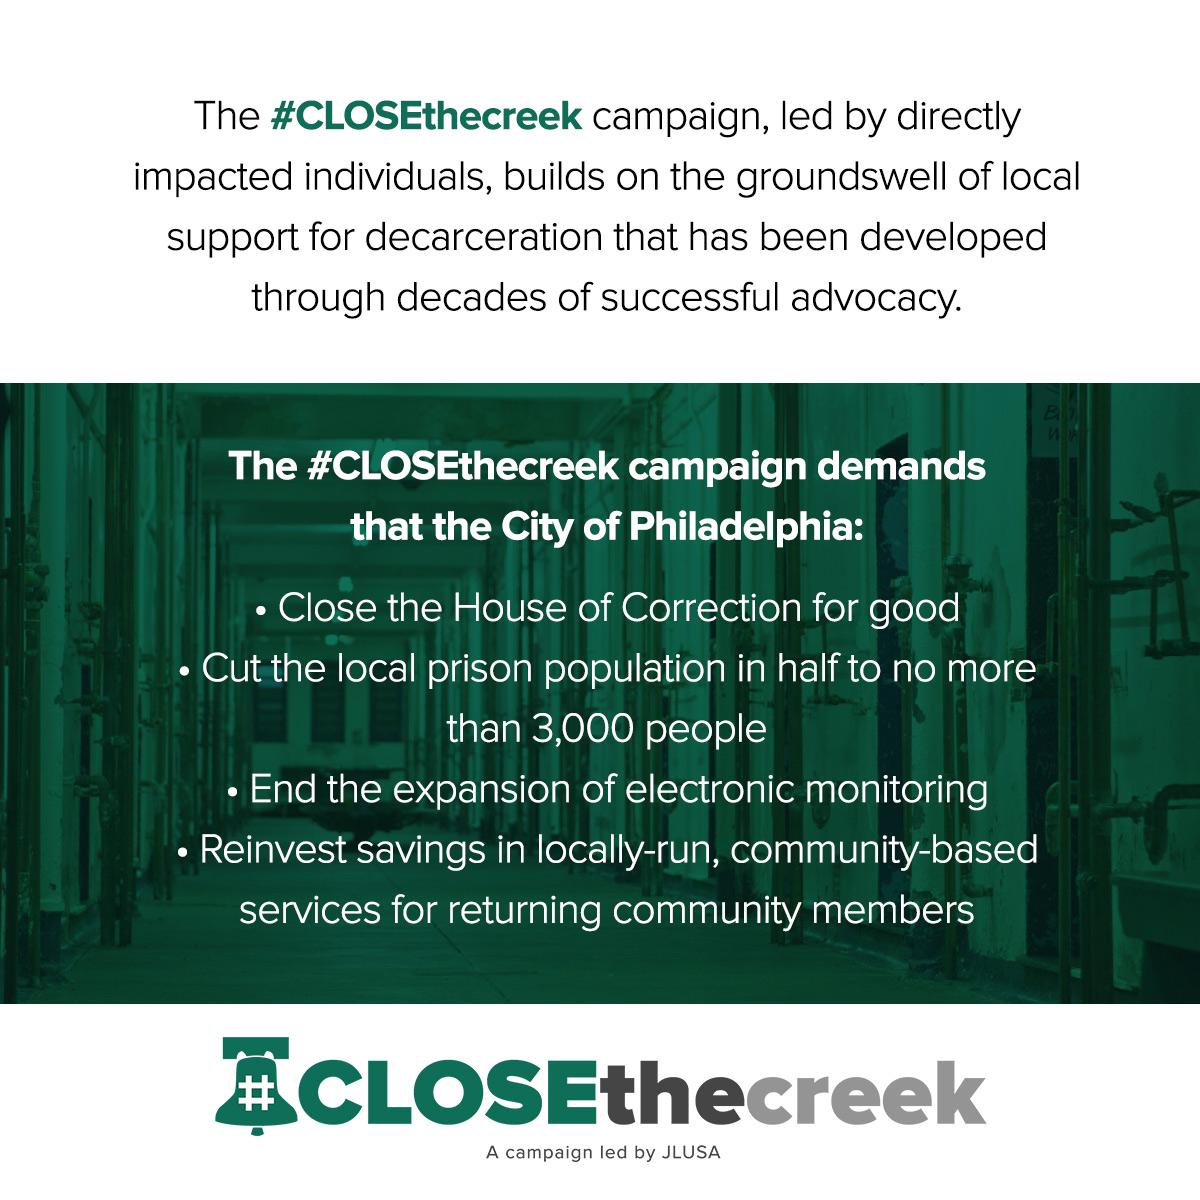 closethecreek-ig-3.jpg